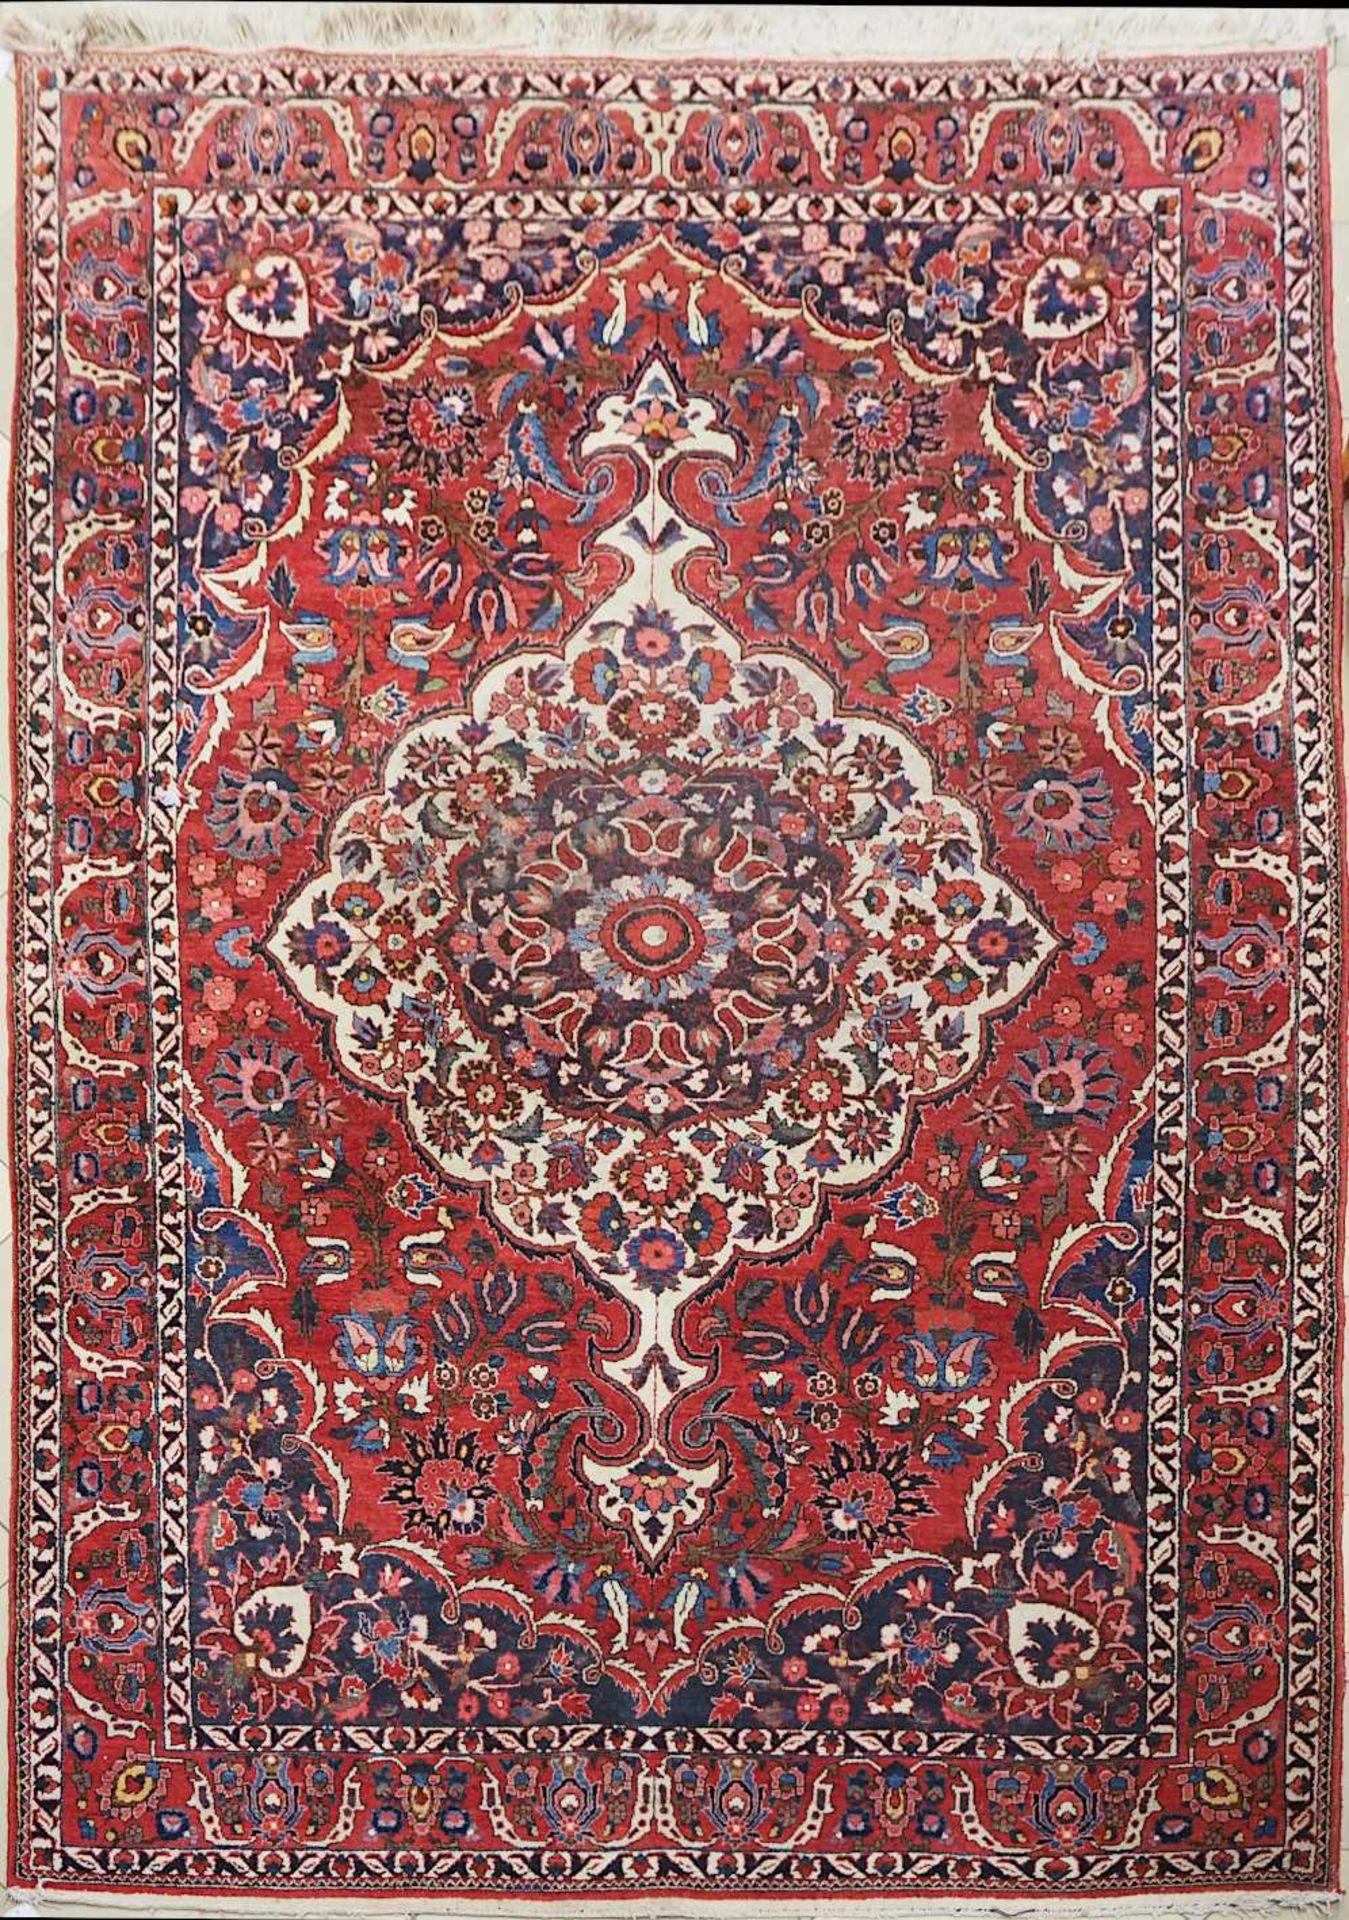 1 Konv. Teppiche 20. Jh.: Mittelfeld beigegrundig, Randbordüre rotgrundig, je florale